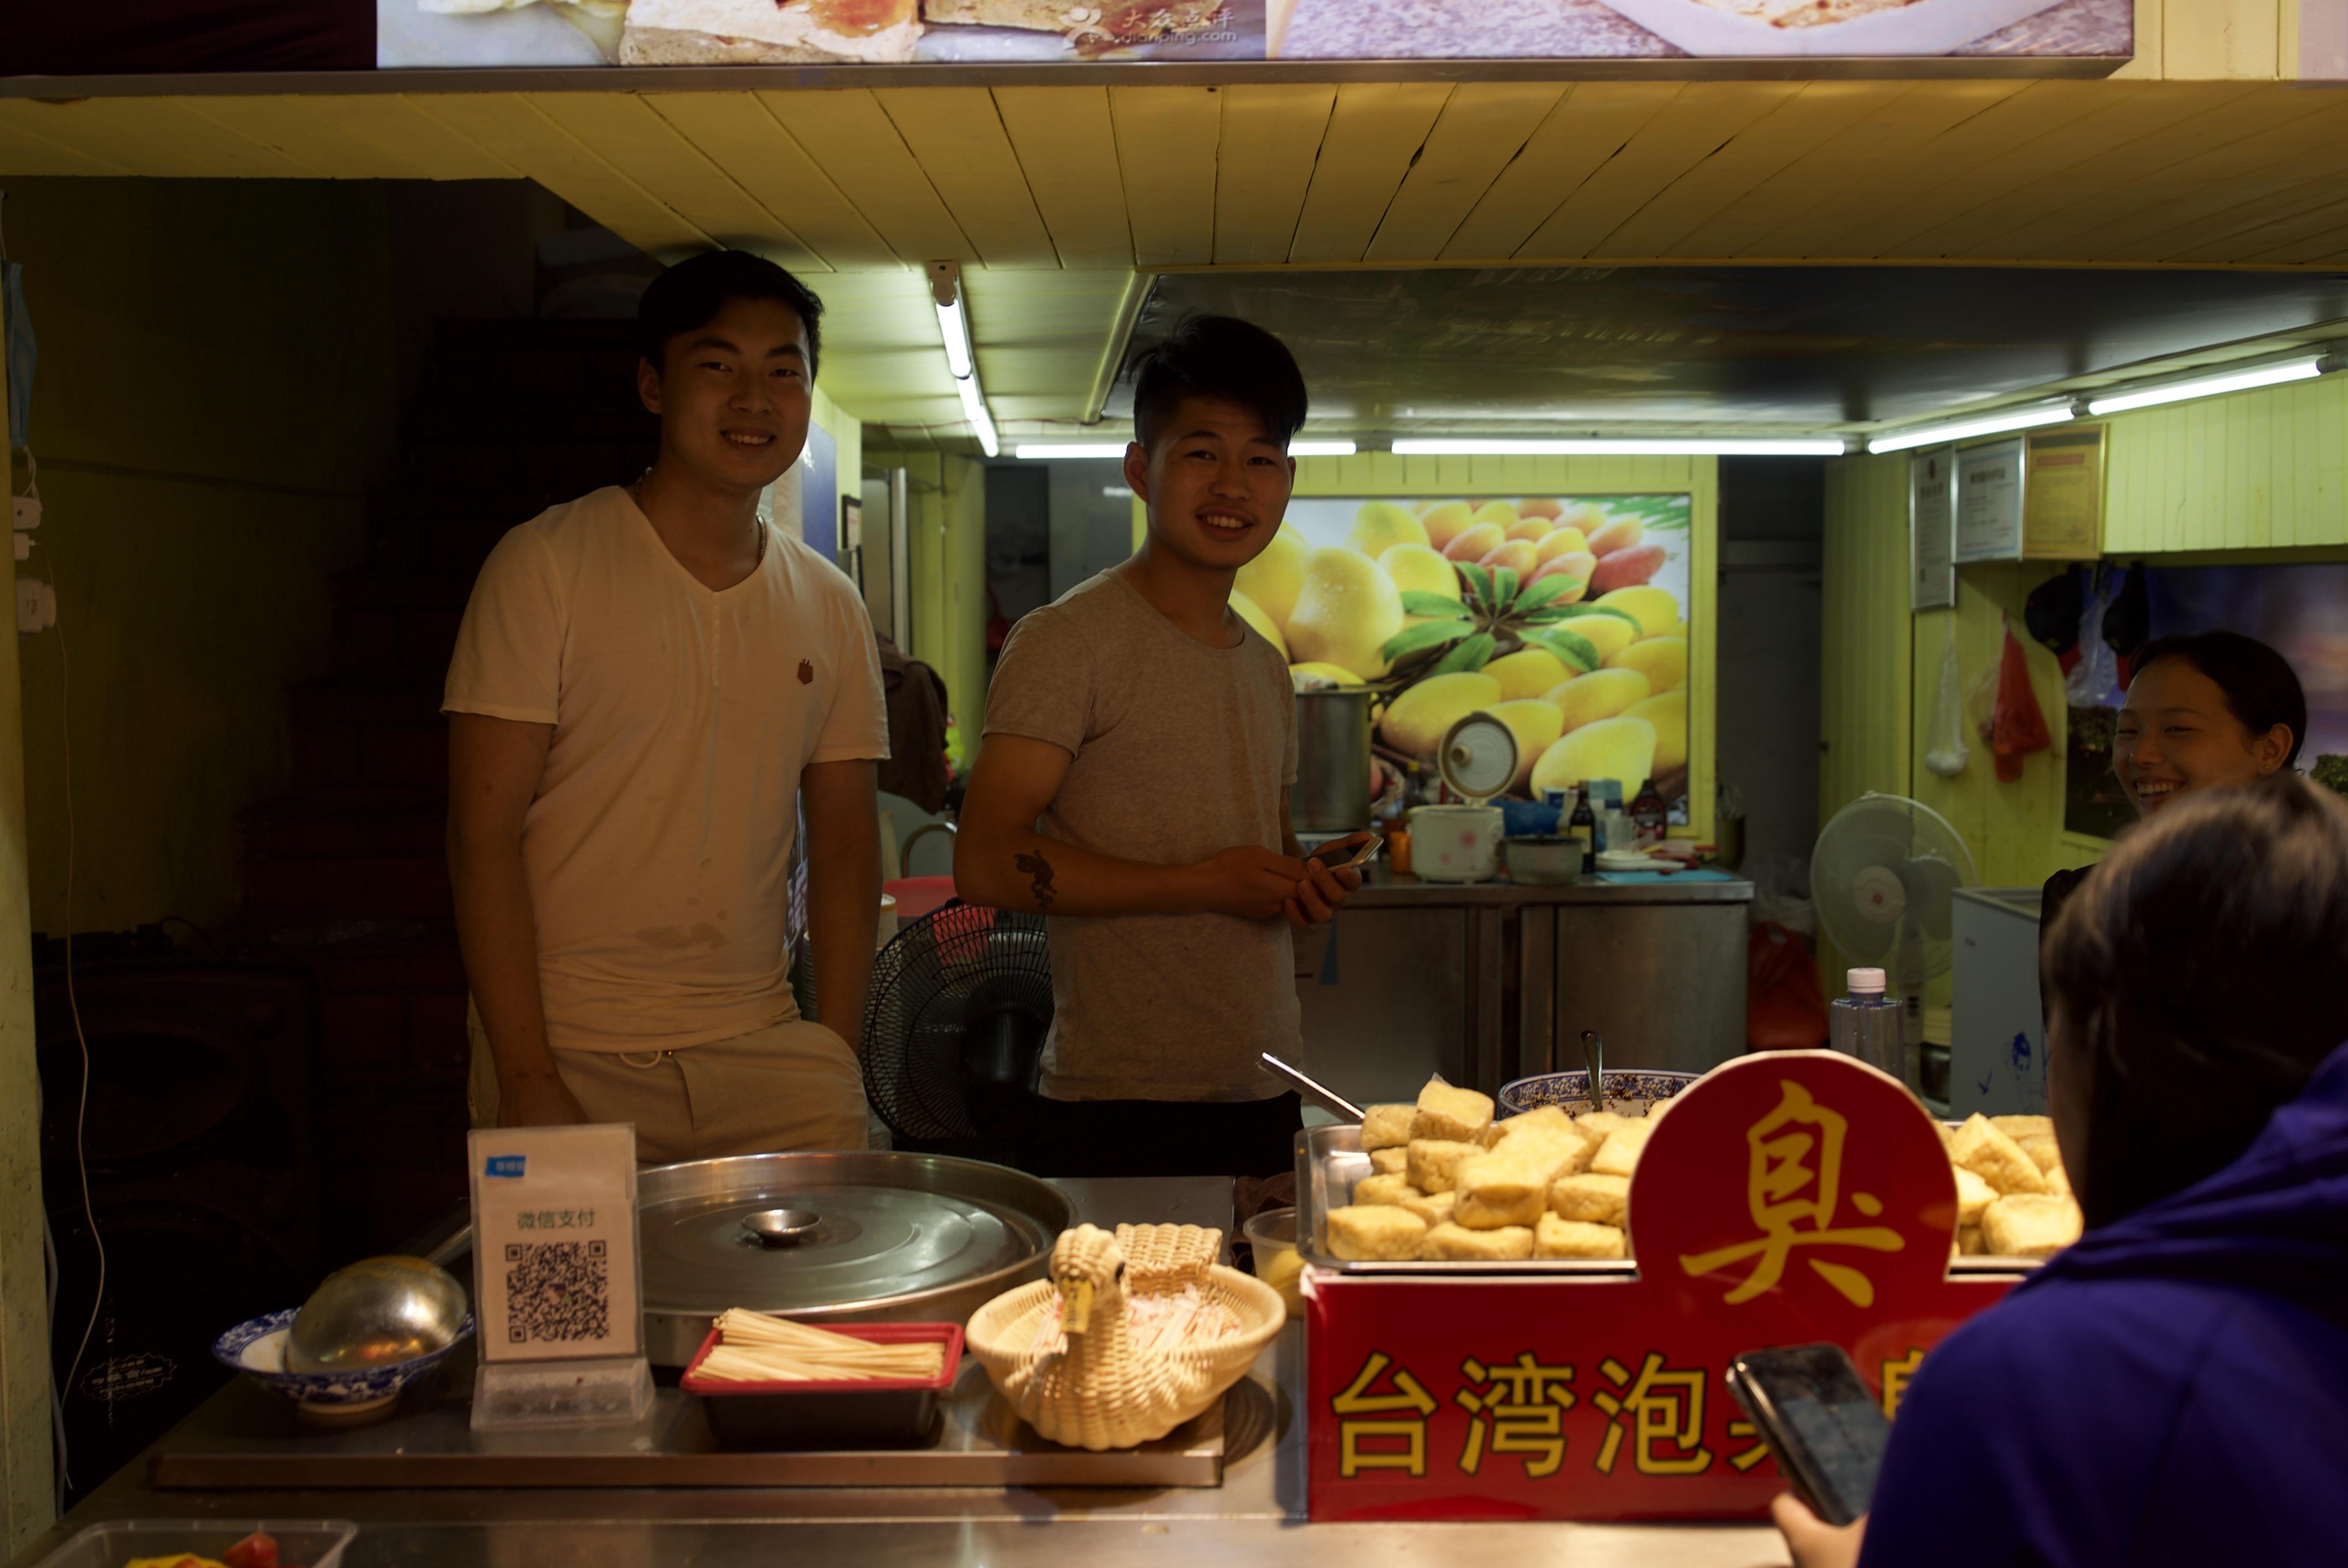 Stinky Tofu (Pao Cai Chou Dou Fu 泡菜臭豆腐)